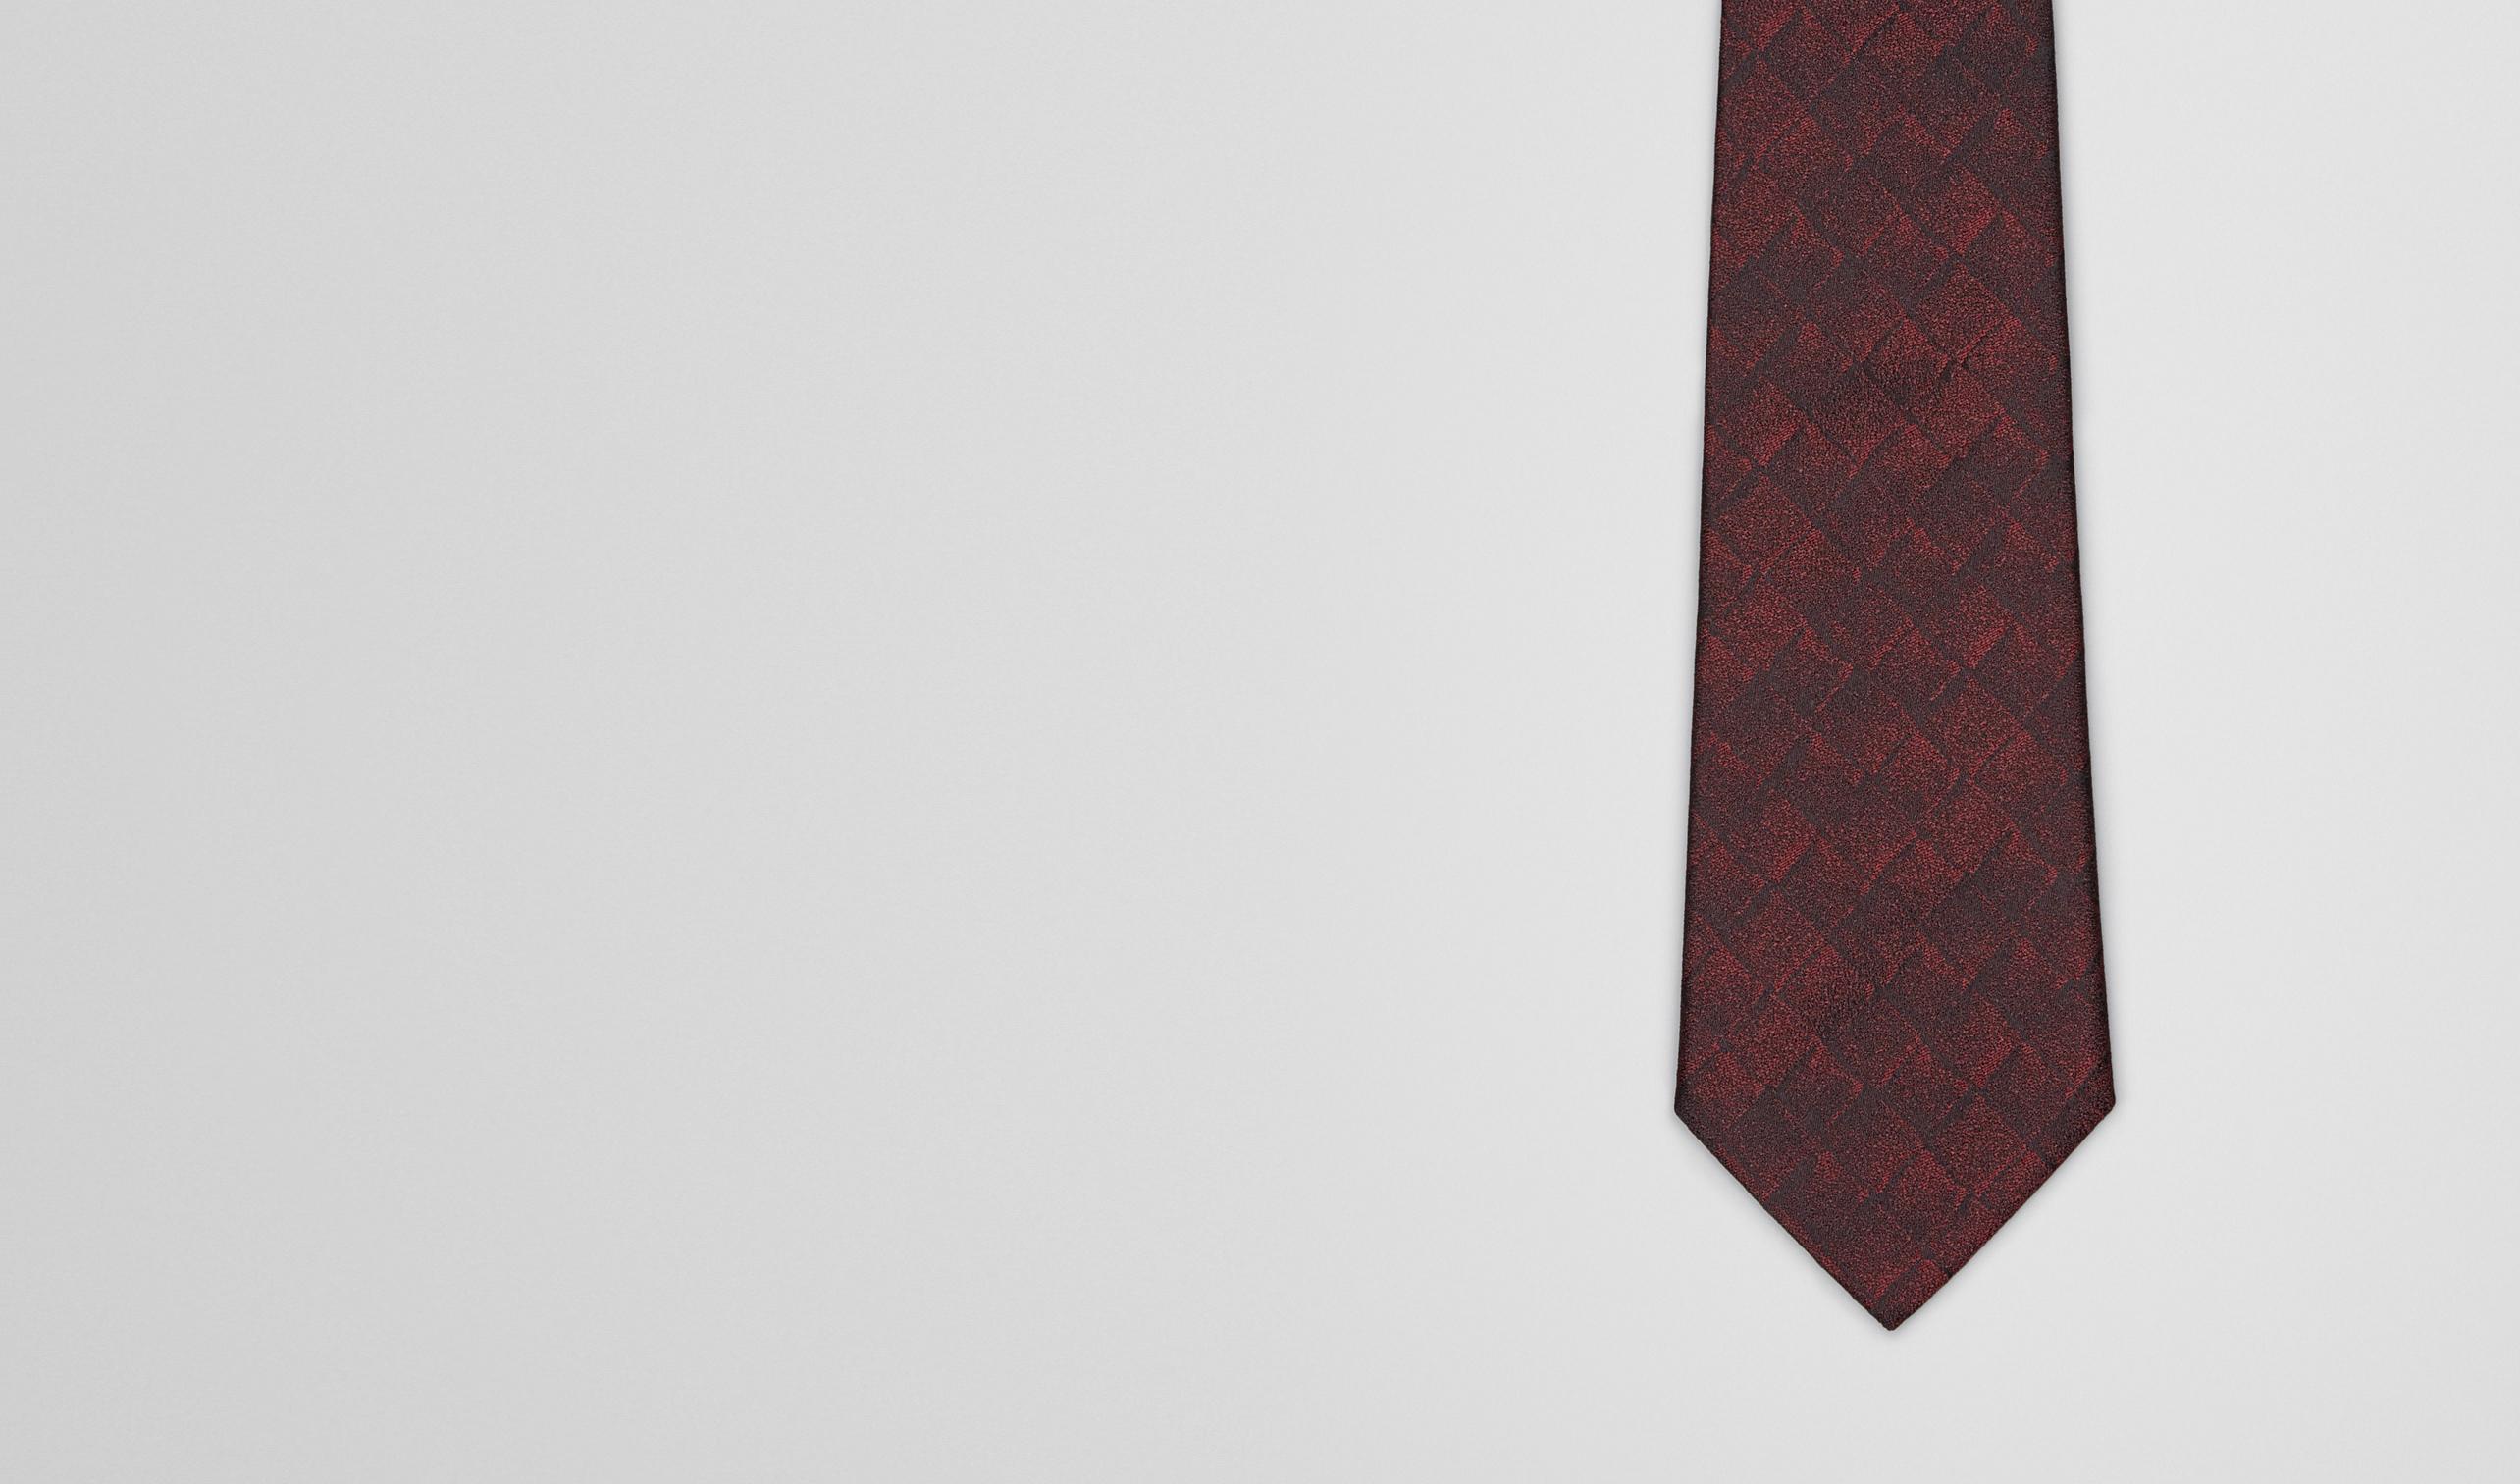 BOTTEGA VENETA Krawatte U KRAWATTE AUS SEIDE IN BORDEAUX BLACK pl